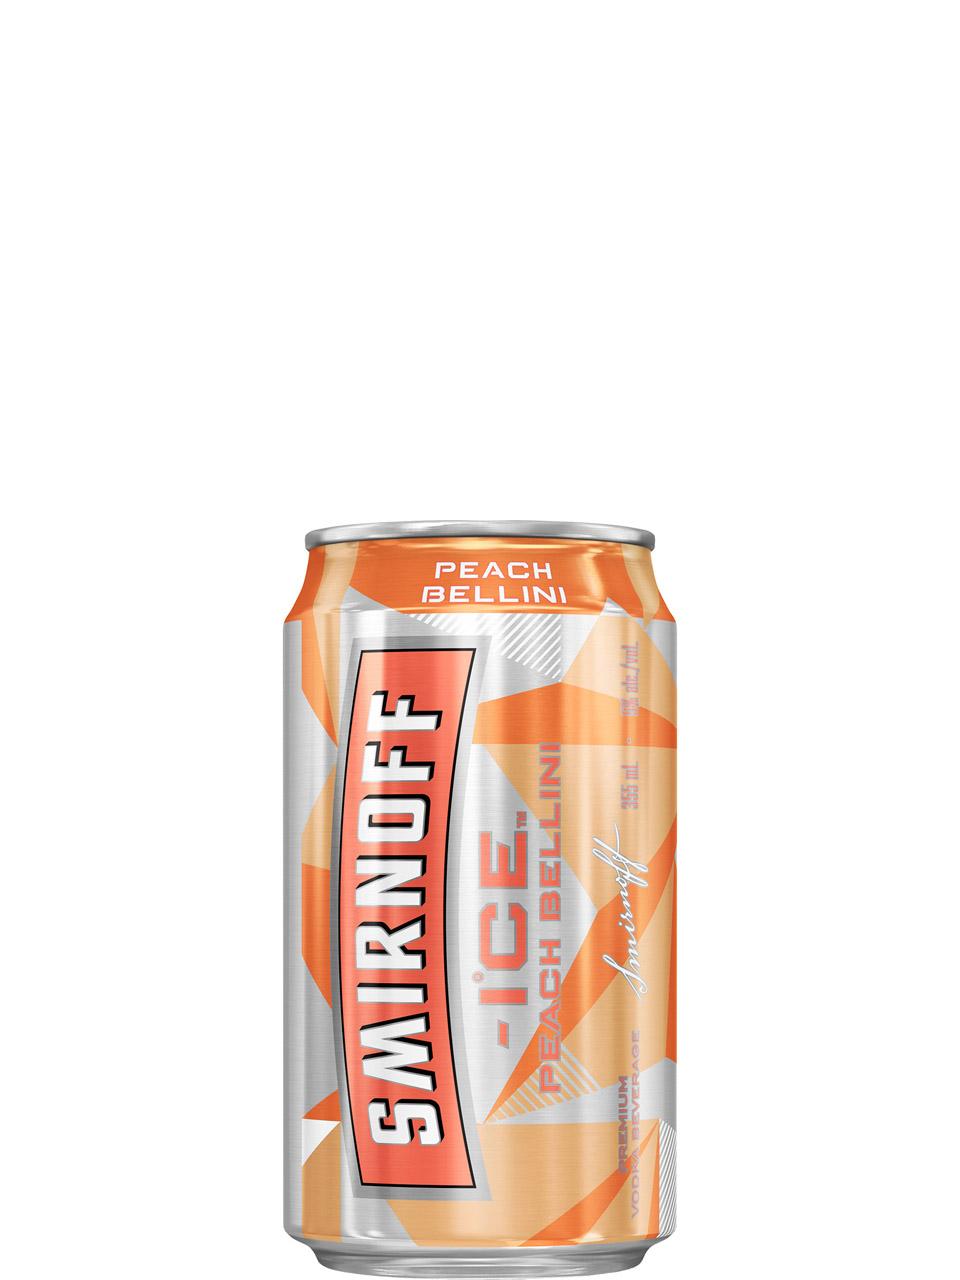 Smirnoff Ice Peach Bellini 6 Pack Cans